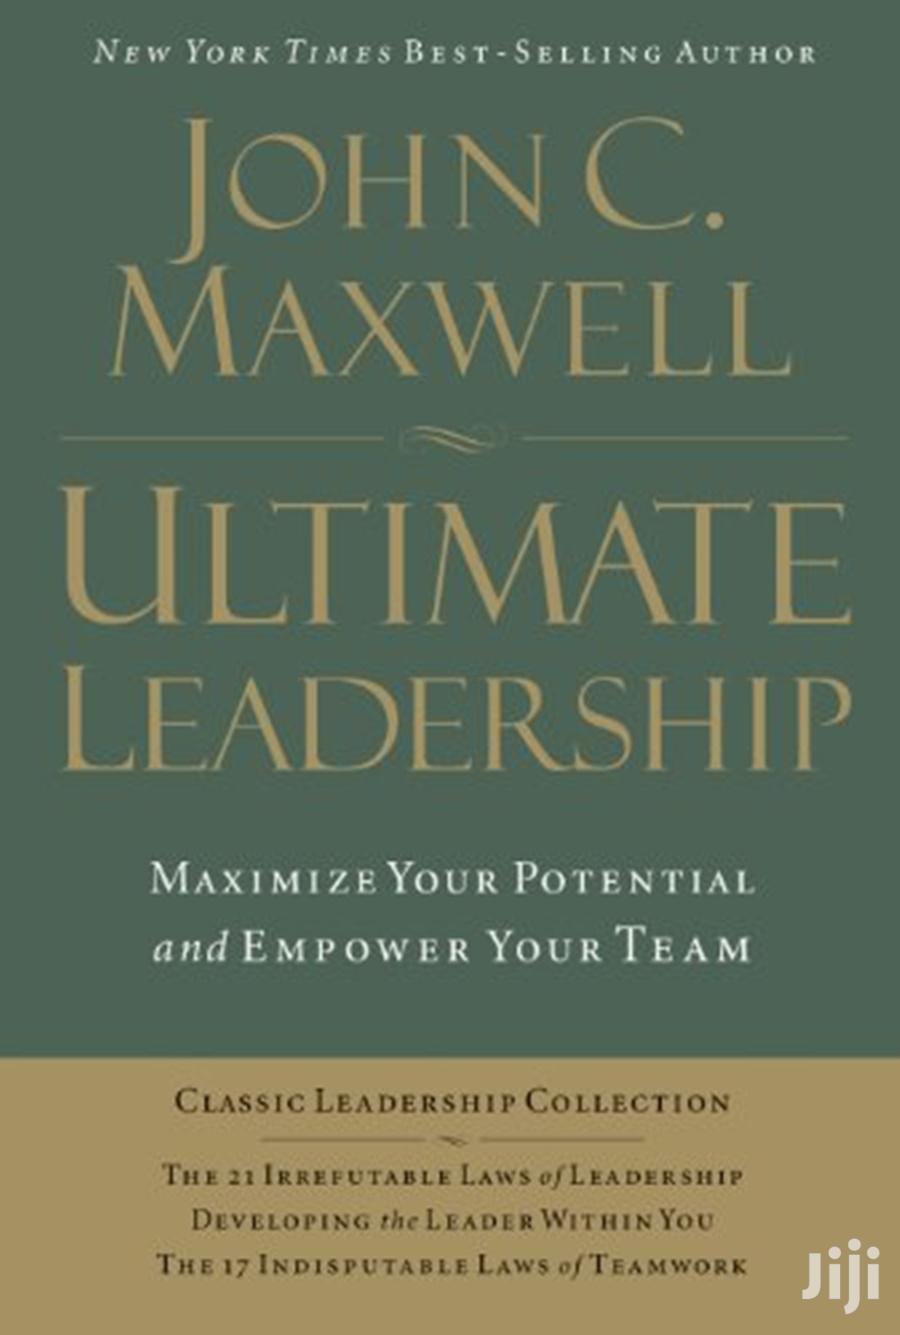 Ultimate Leadership- John Maxwell